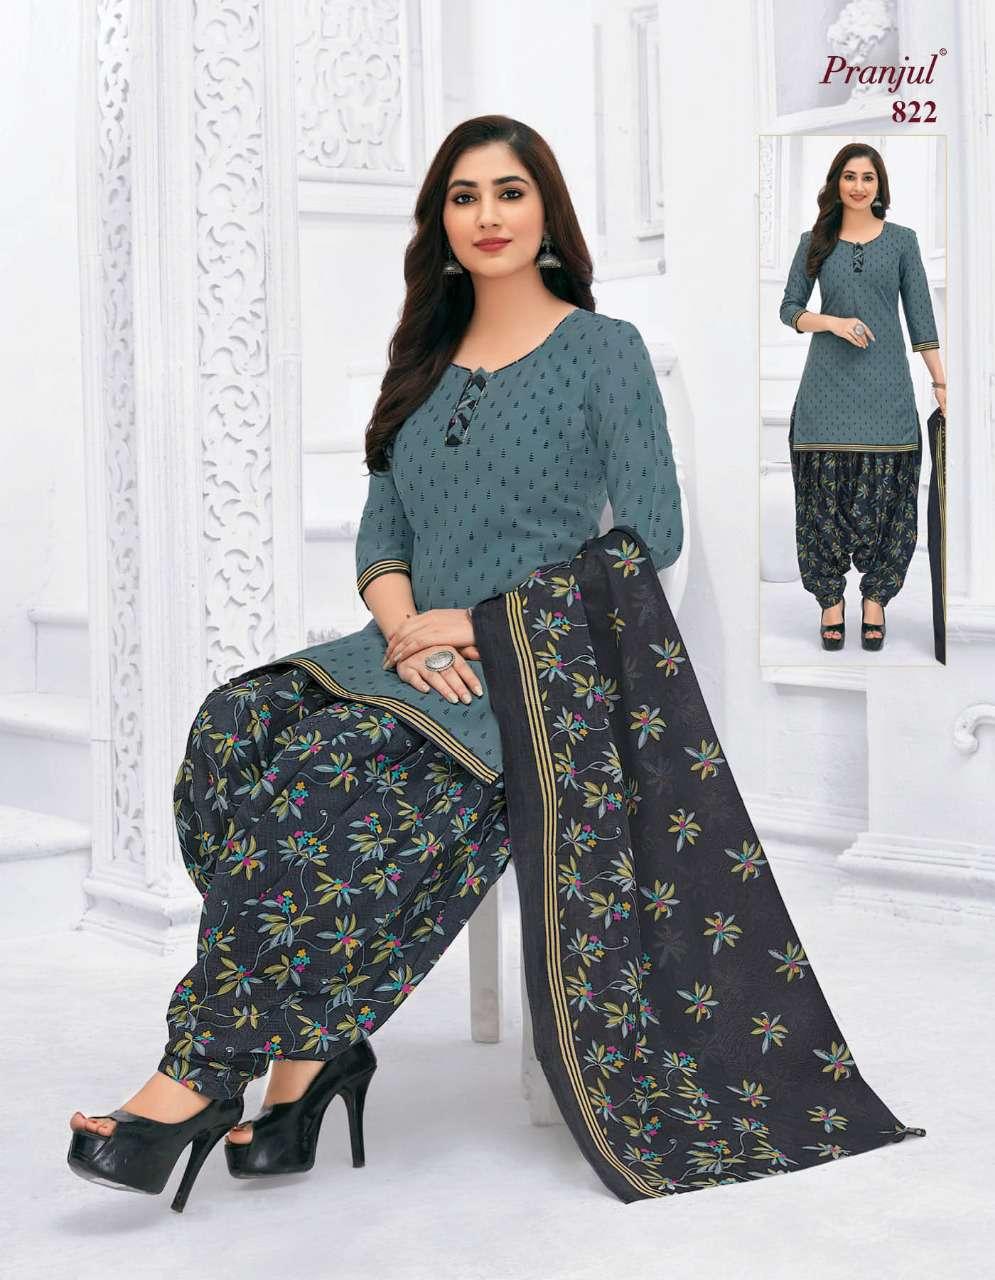 Pranjul 3XL Priyanka Vol 8 A Readymade Suit Wholesale Catalog 15 Pcs 12 - Pranjul 3XL Priyanka Vol 8 A Readymade Suit Wholesale Catalog 15 Pcs